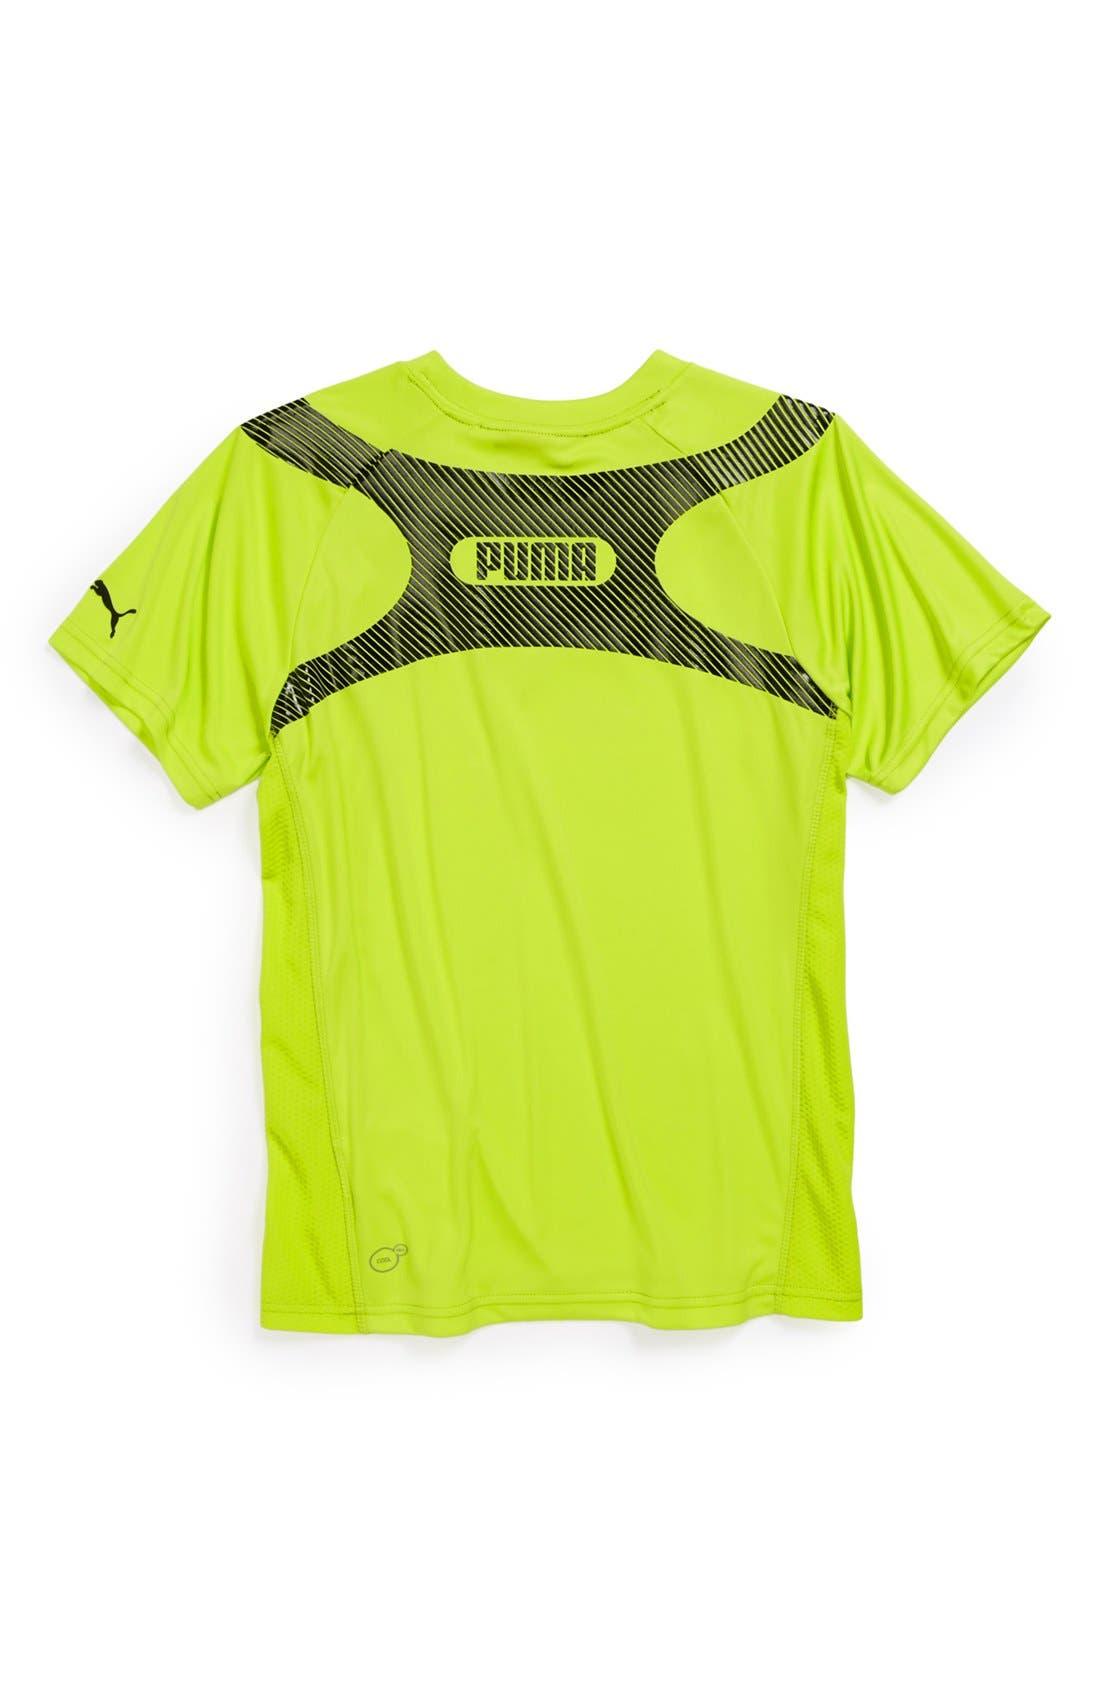 Alternate Image 2  - PUMA 'Acceleration' Short Sleeve T-Shirt (Little Boys)